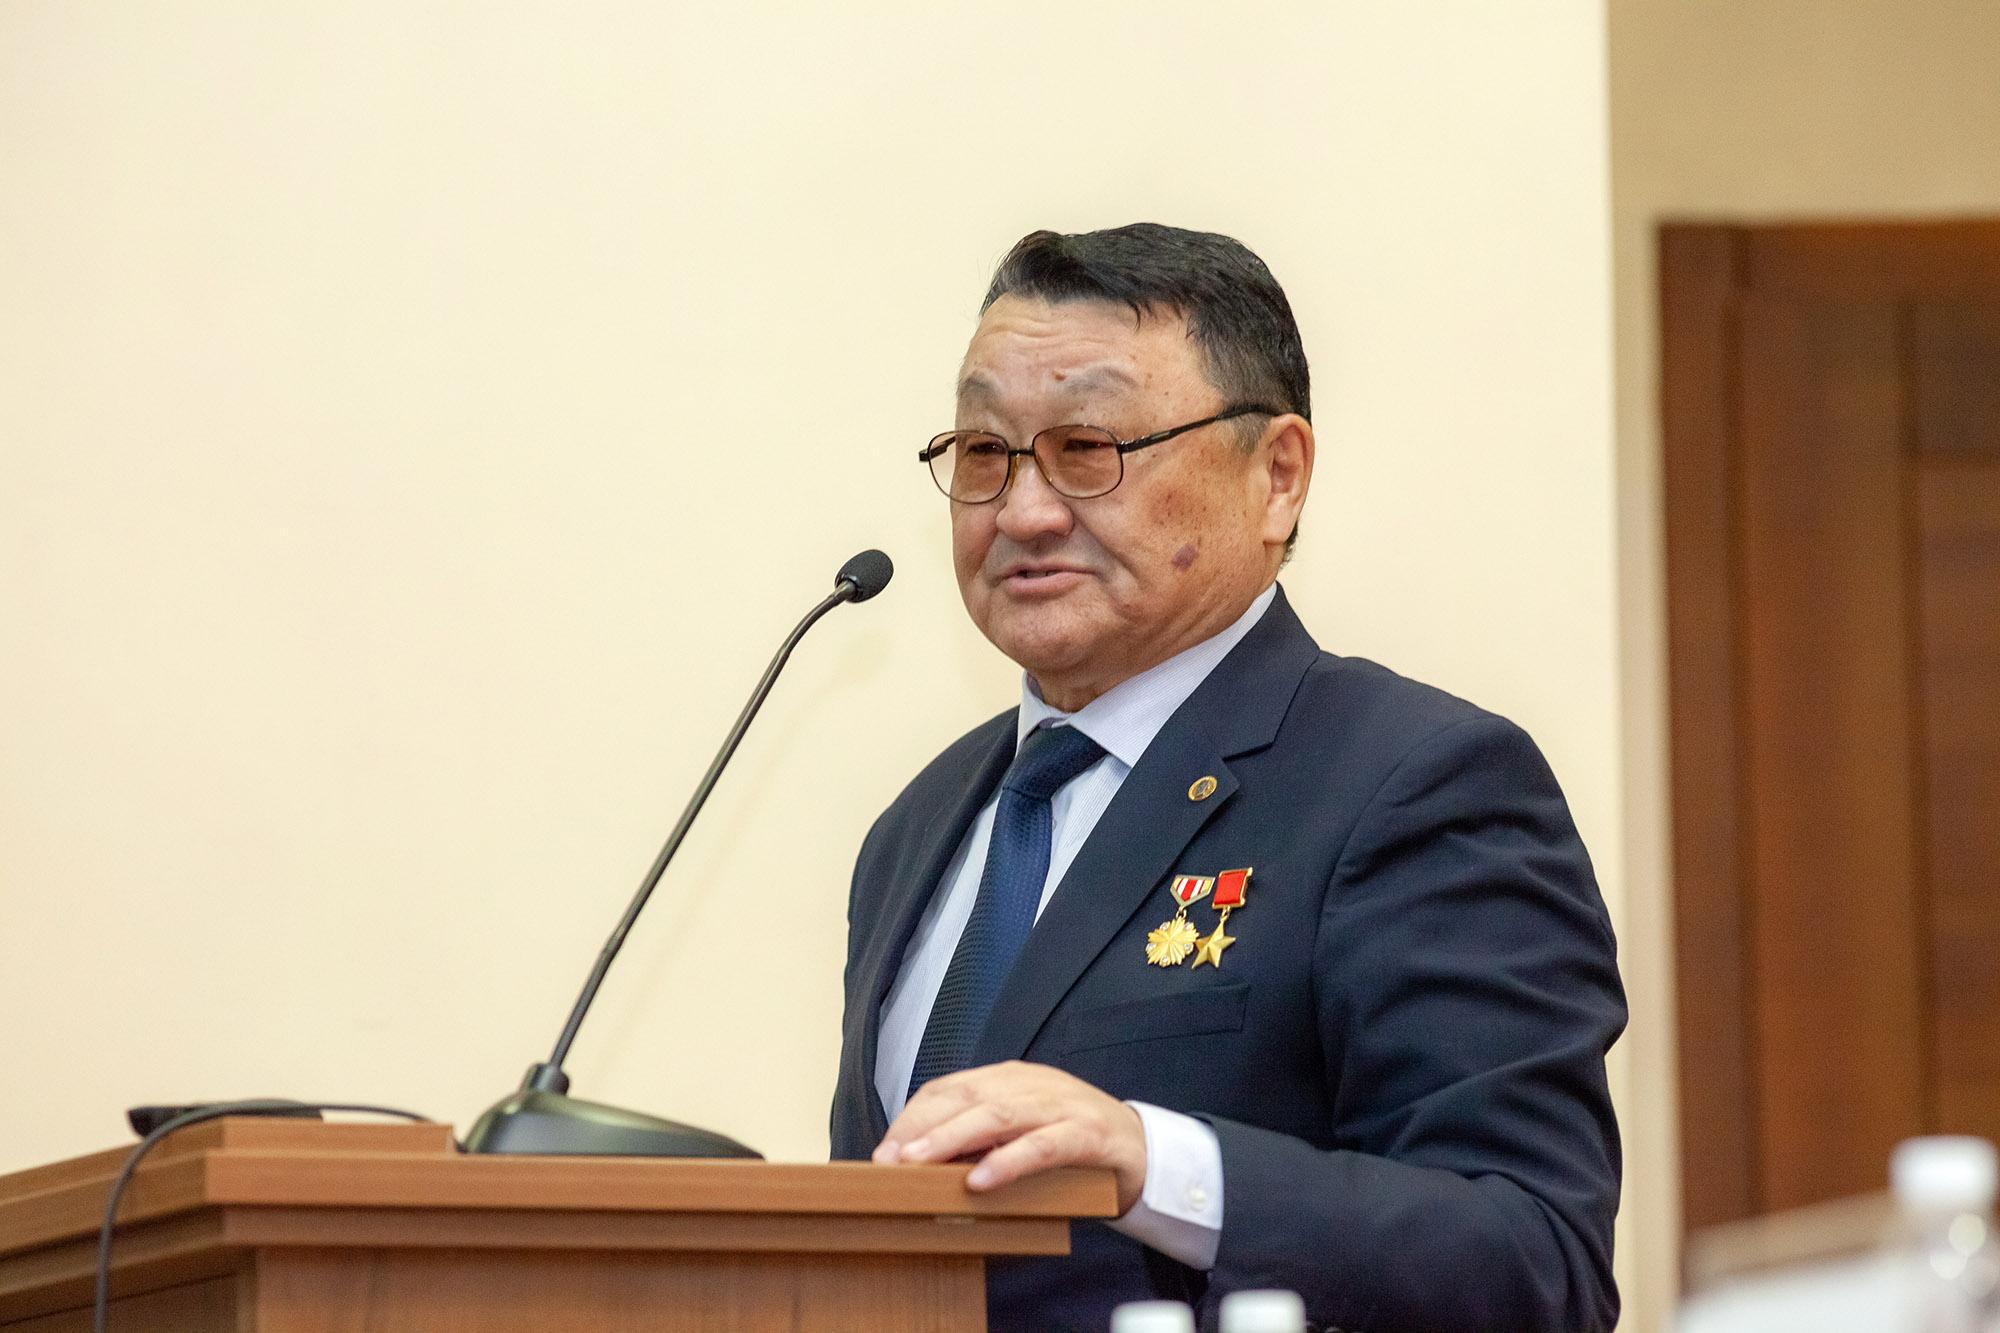 Космонавт Монголии Жүгдэрдэмид Гүррагчаа